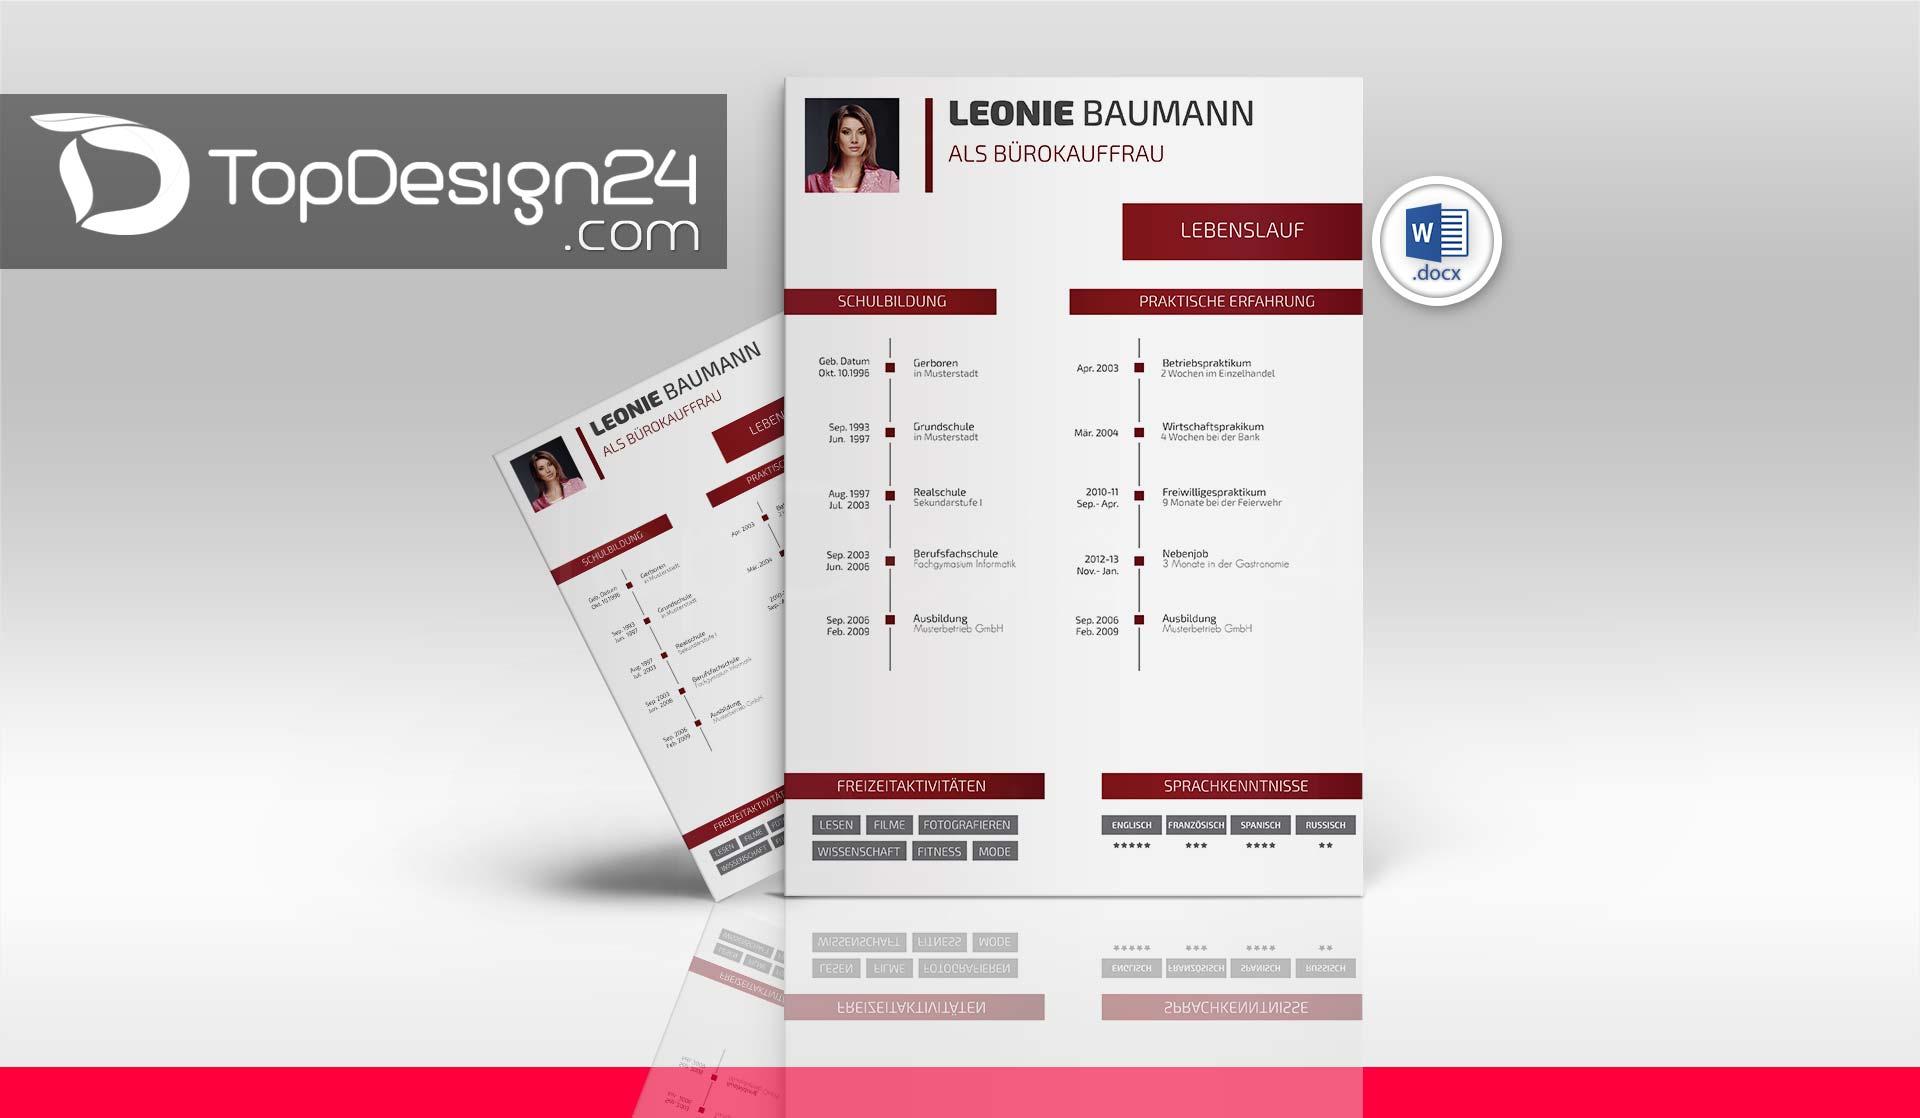 Online Bewerbung Muster Topdesign24